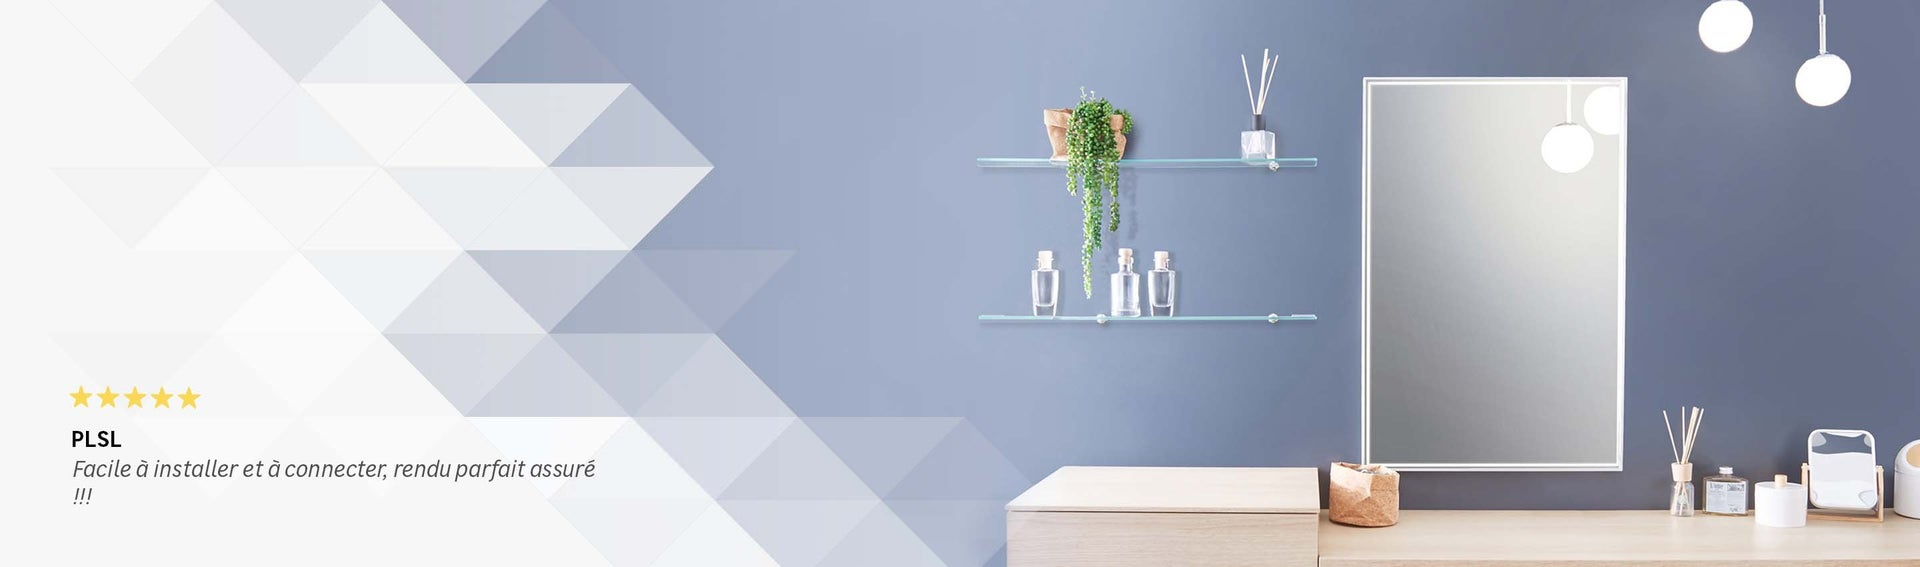 Beautiful salle de bain accessoire photos for Accessoires de salle de bain linen chest